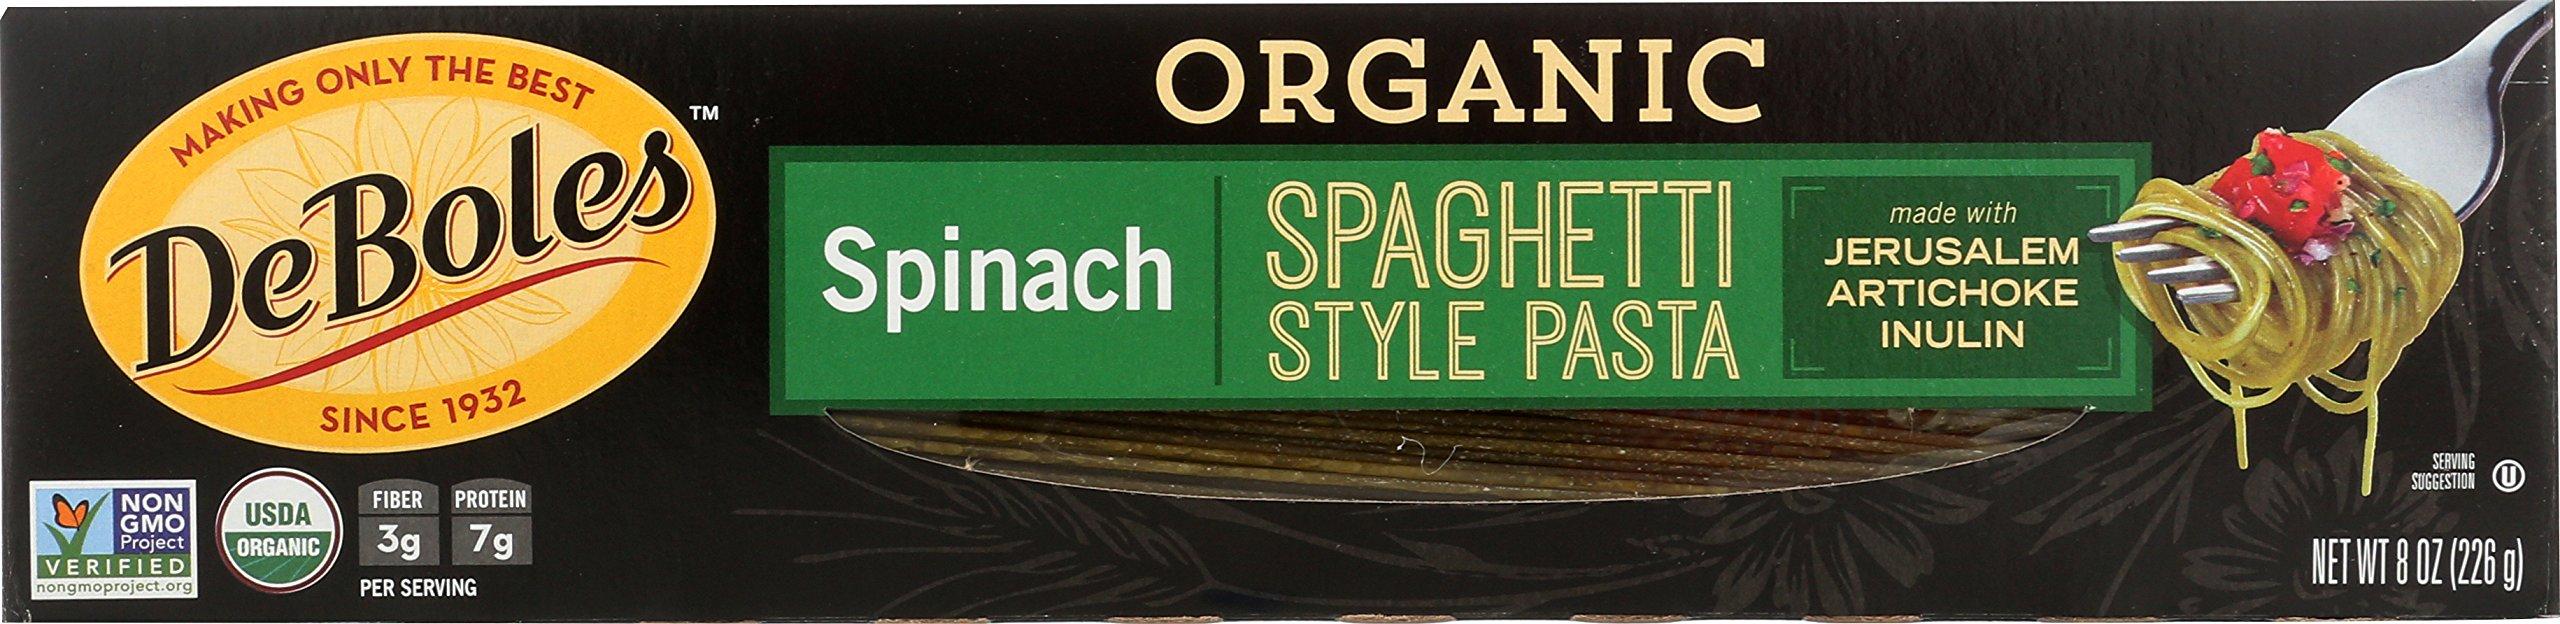 DeBoles Organic Spinach Pasta, Spaghetti, 8 Ounce (Pack of 12)